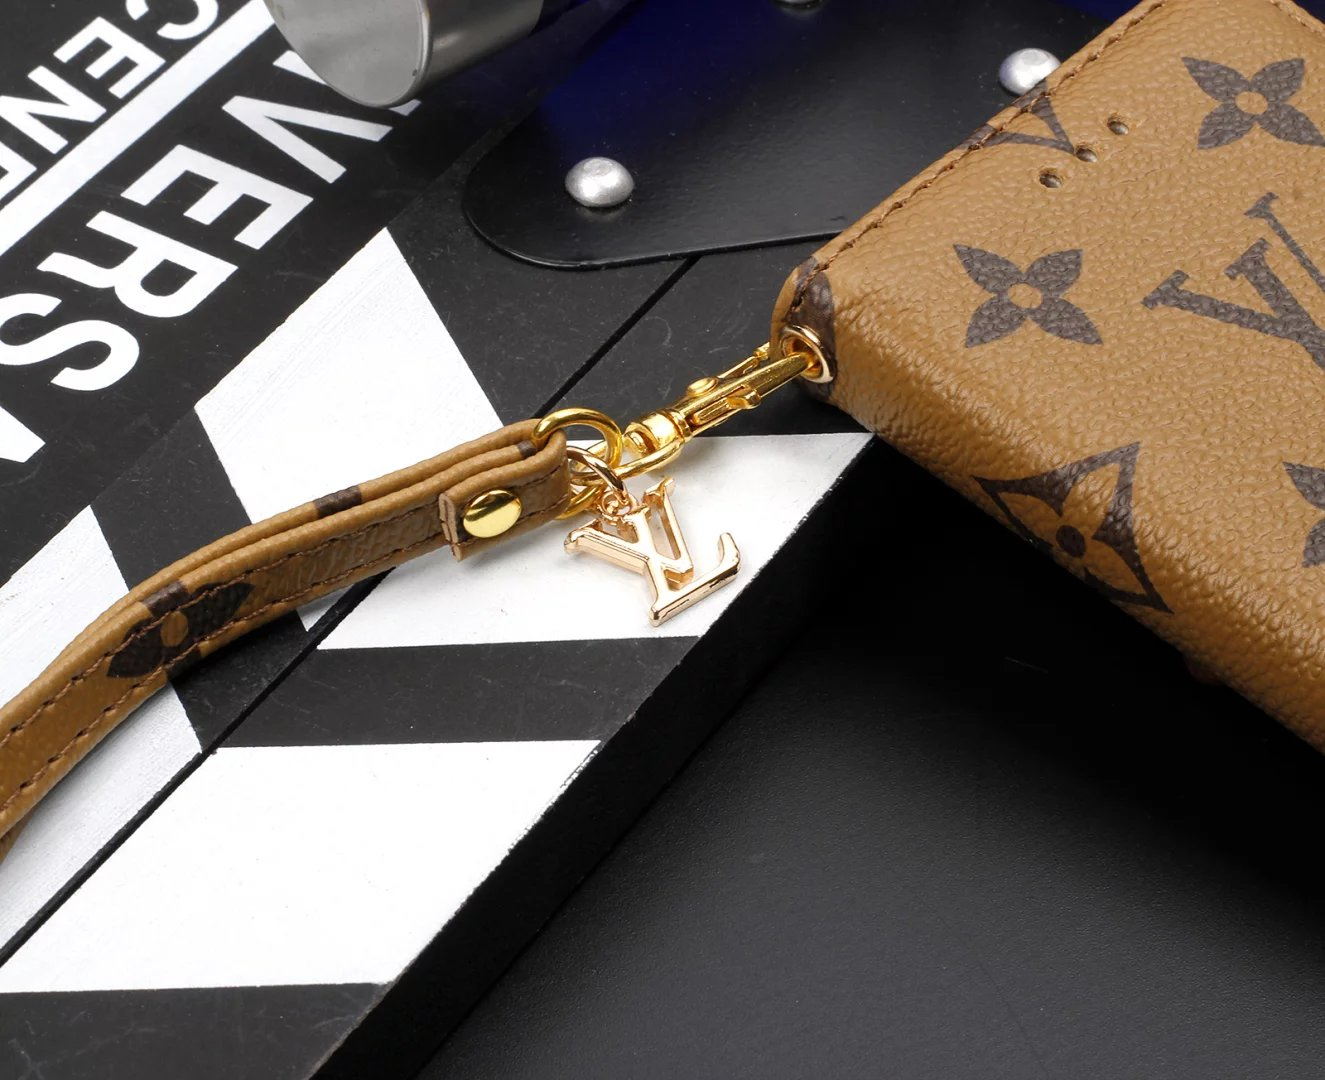 individuelle iphone hülle handy hülle iphone Louis Vuitton iphone 8 hüllen iphone 8 schutzhülle leder handyhülle 8lbst gestalten foto iphone 8 hülle test hülle iphone 8 gold iphone cover drucken iphone 8 arbon ca8